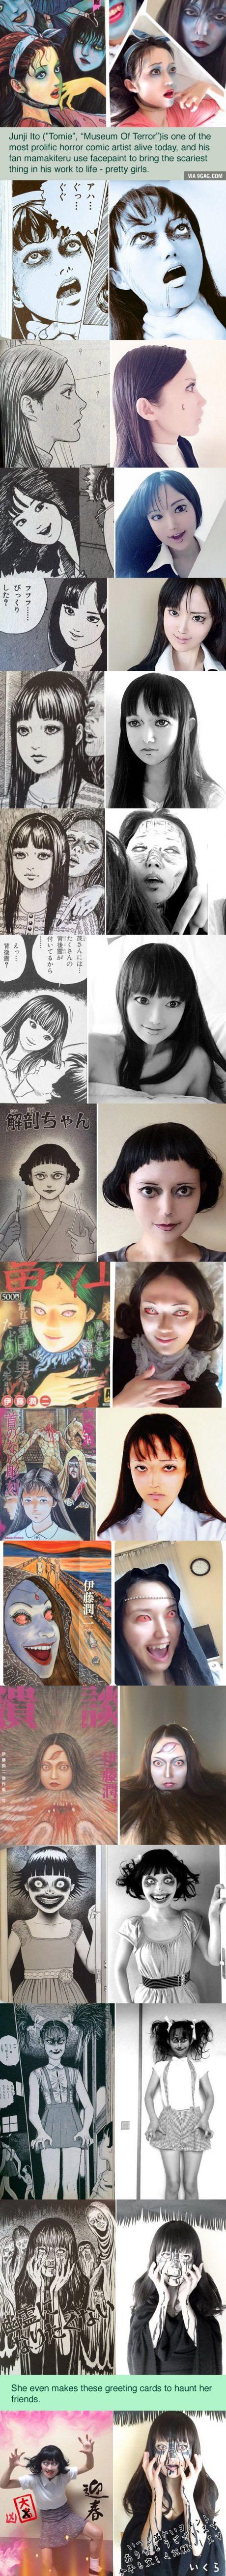 Talented girl's Junji Ito cosplay will haunt your dreams (By Mamakiteru)